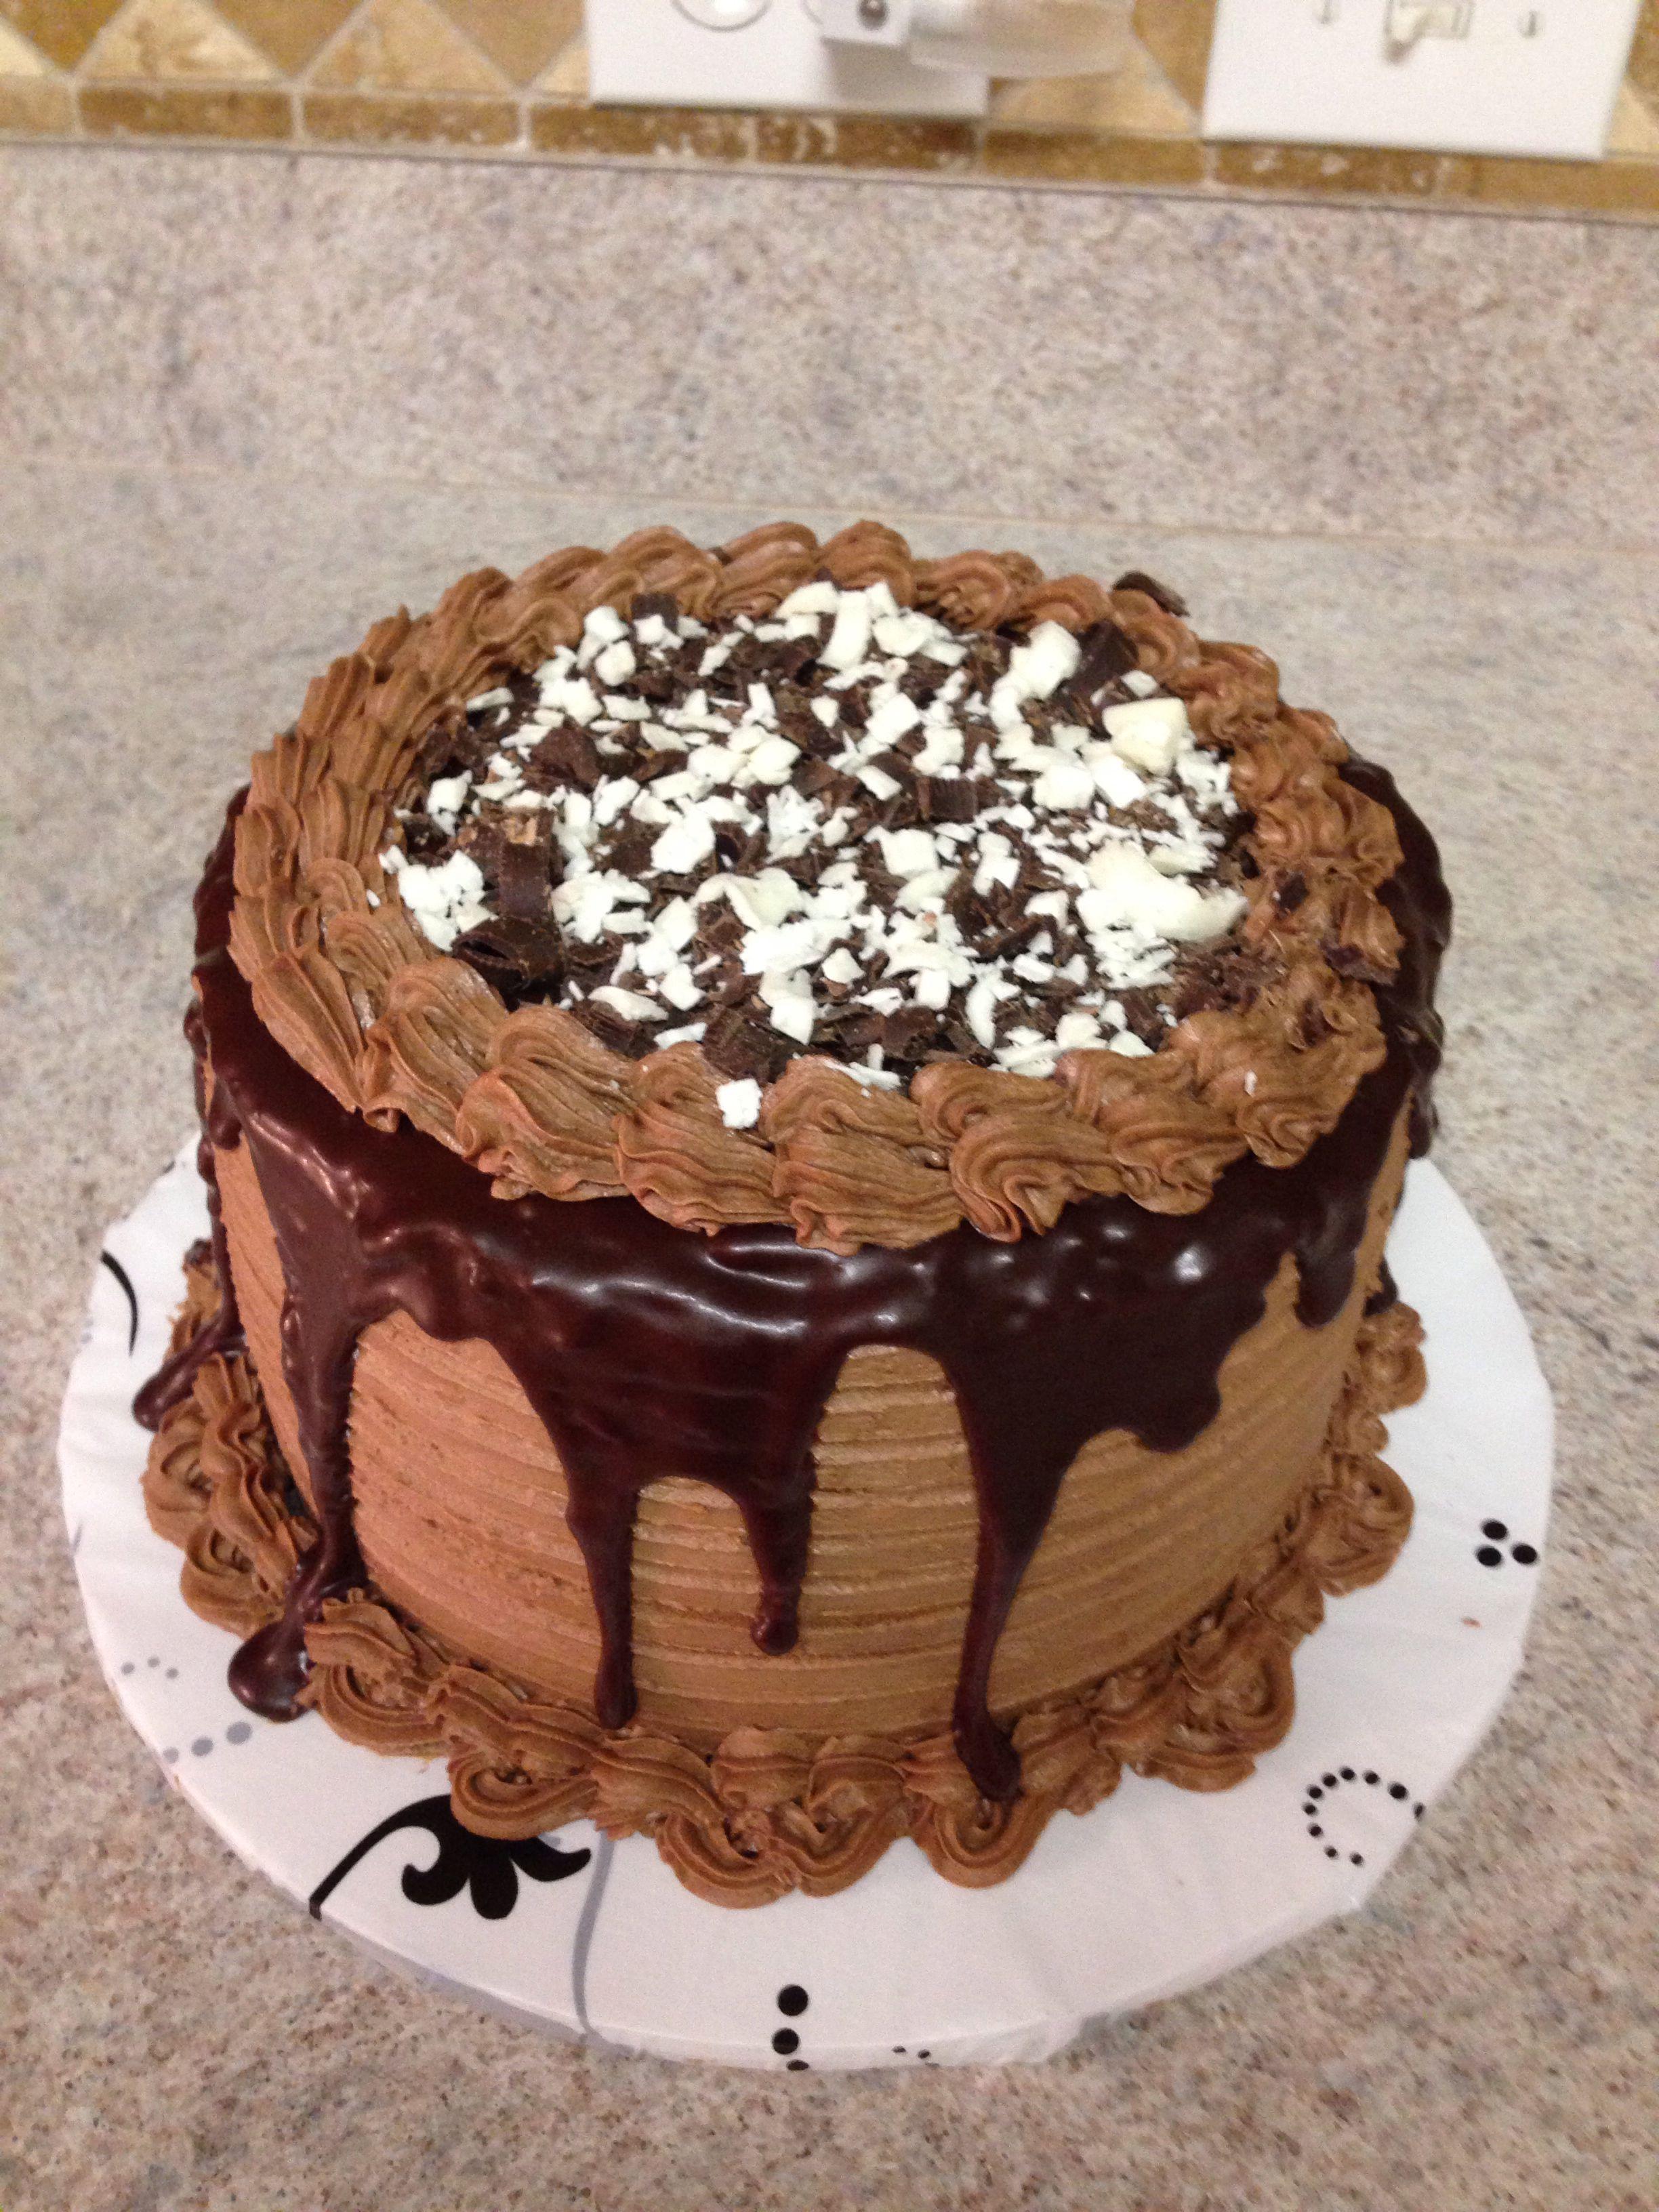 Chocolate ganache cake with images cake chocolate